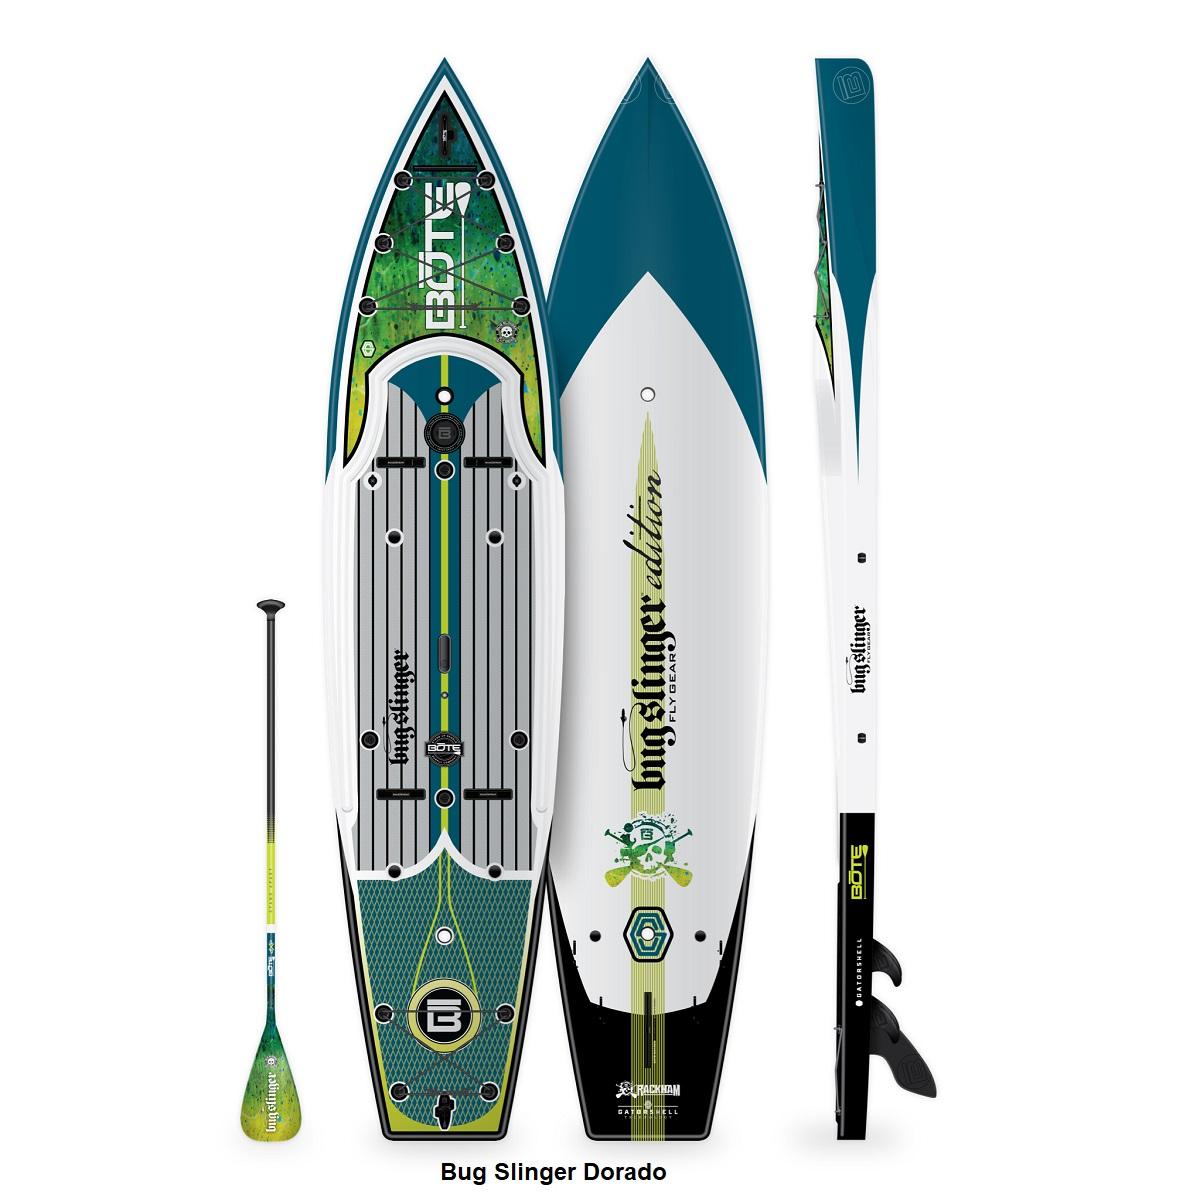 BOTE Rackham 12' Paddle Board - Bug Slinger Dorado